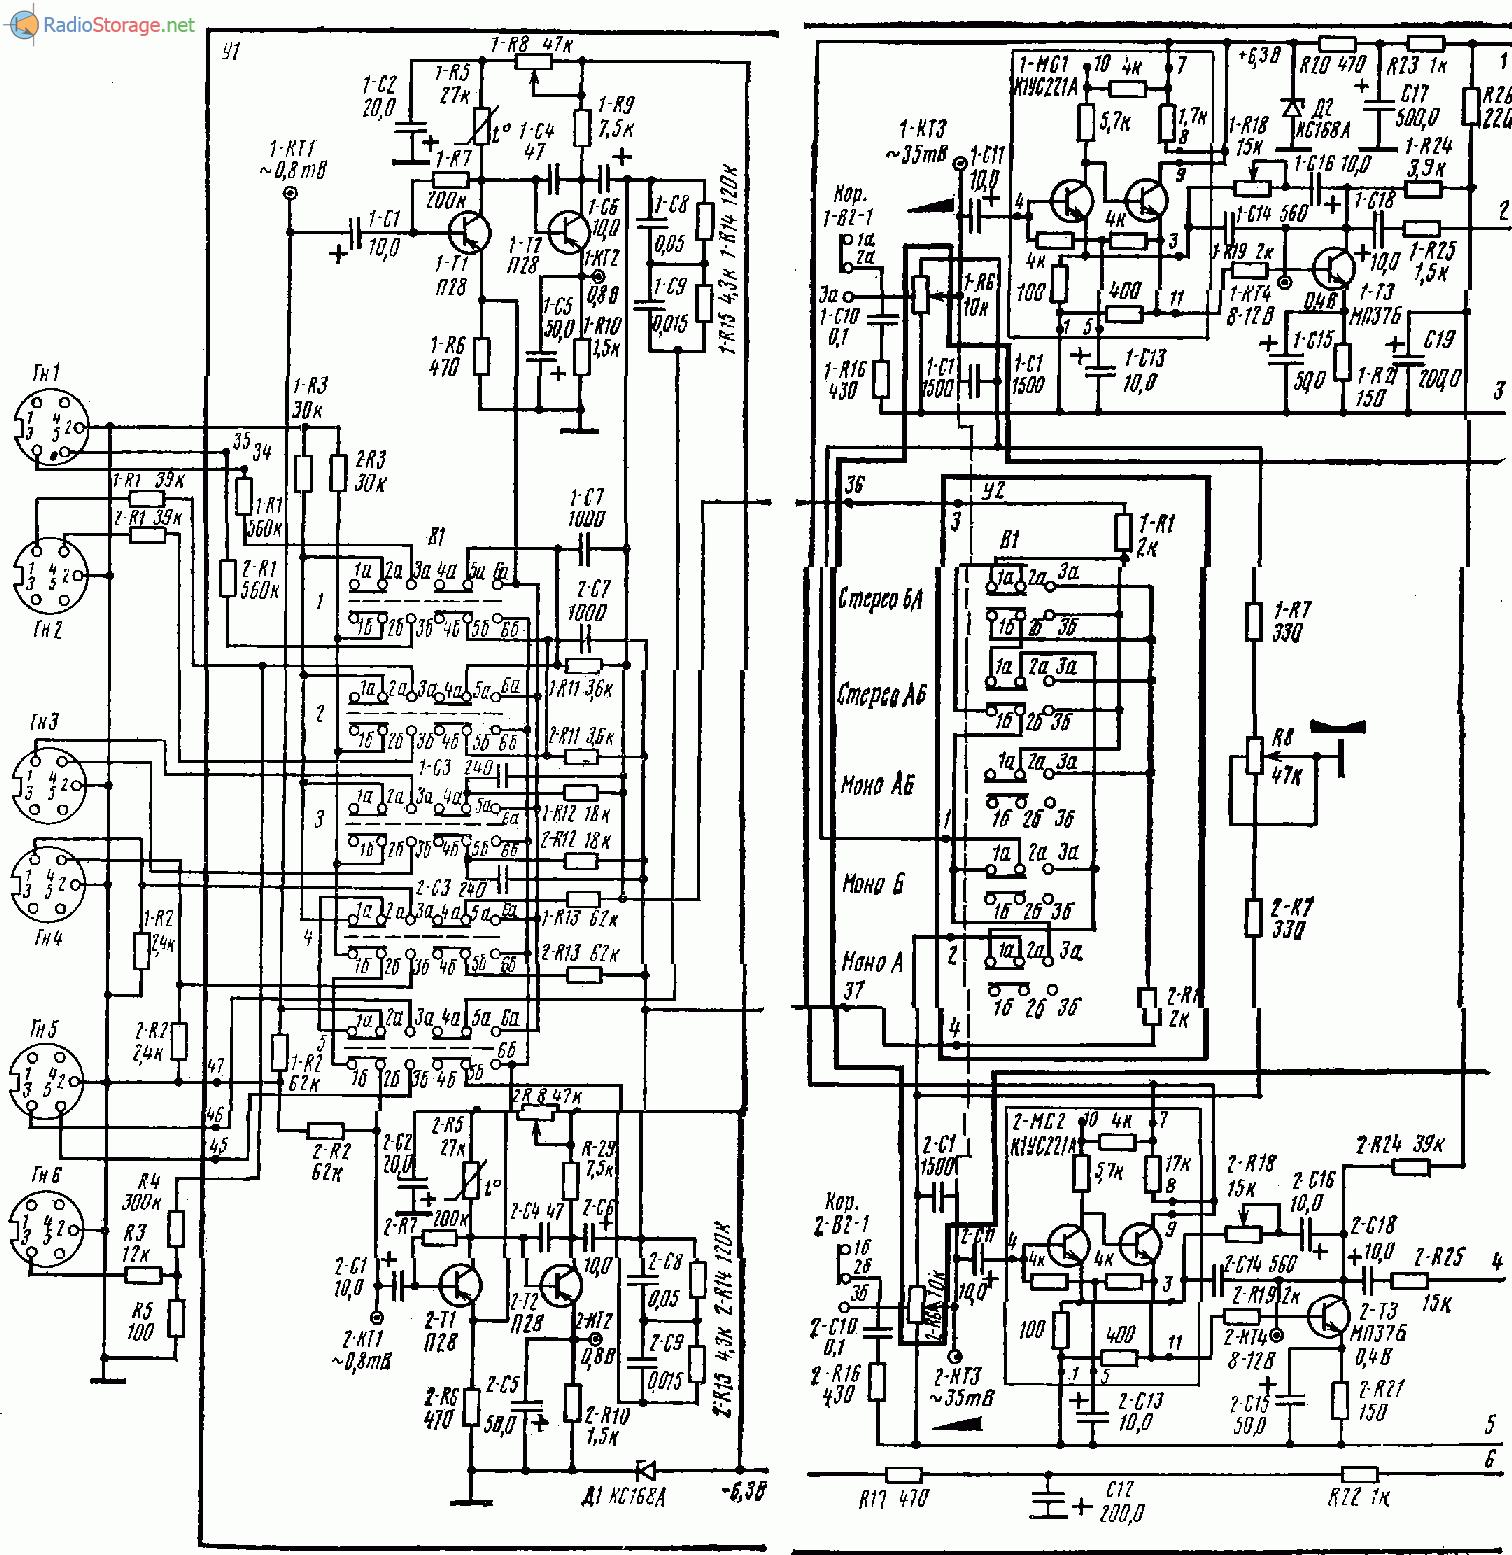 Схема усилителя бриг 001 стерео фото 191